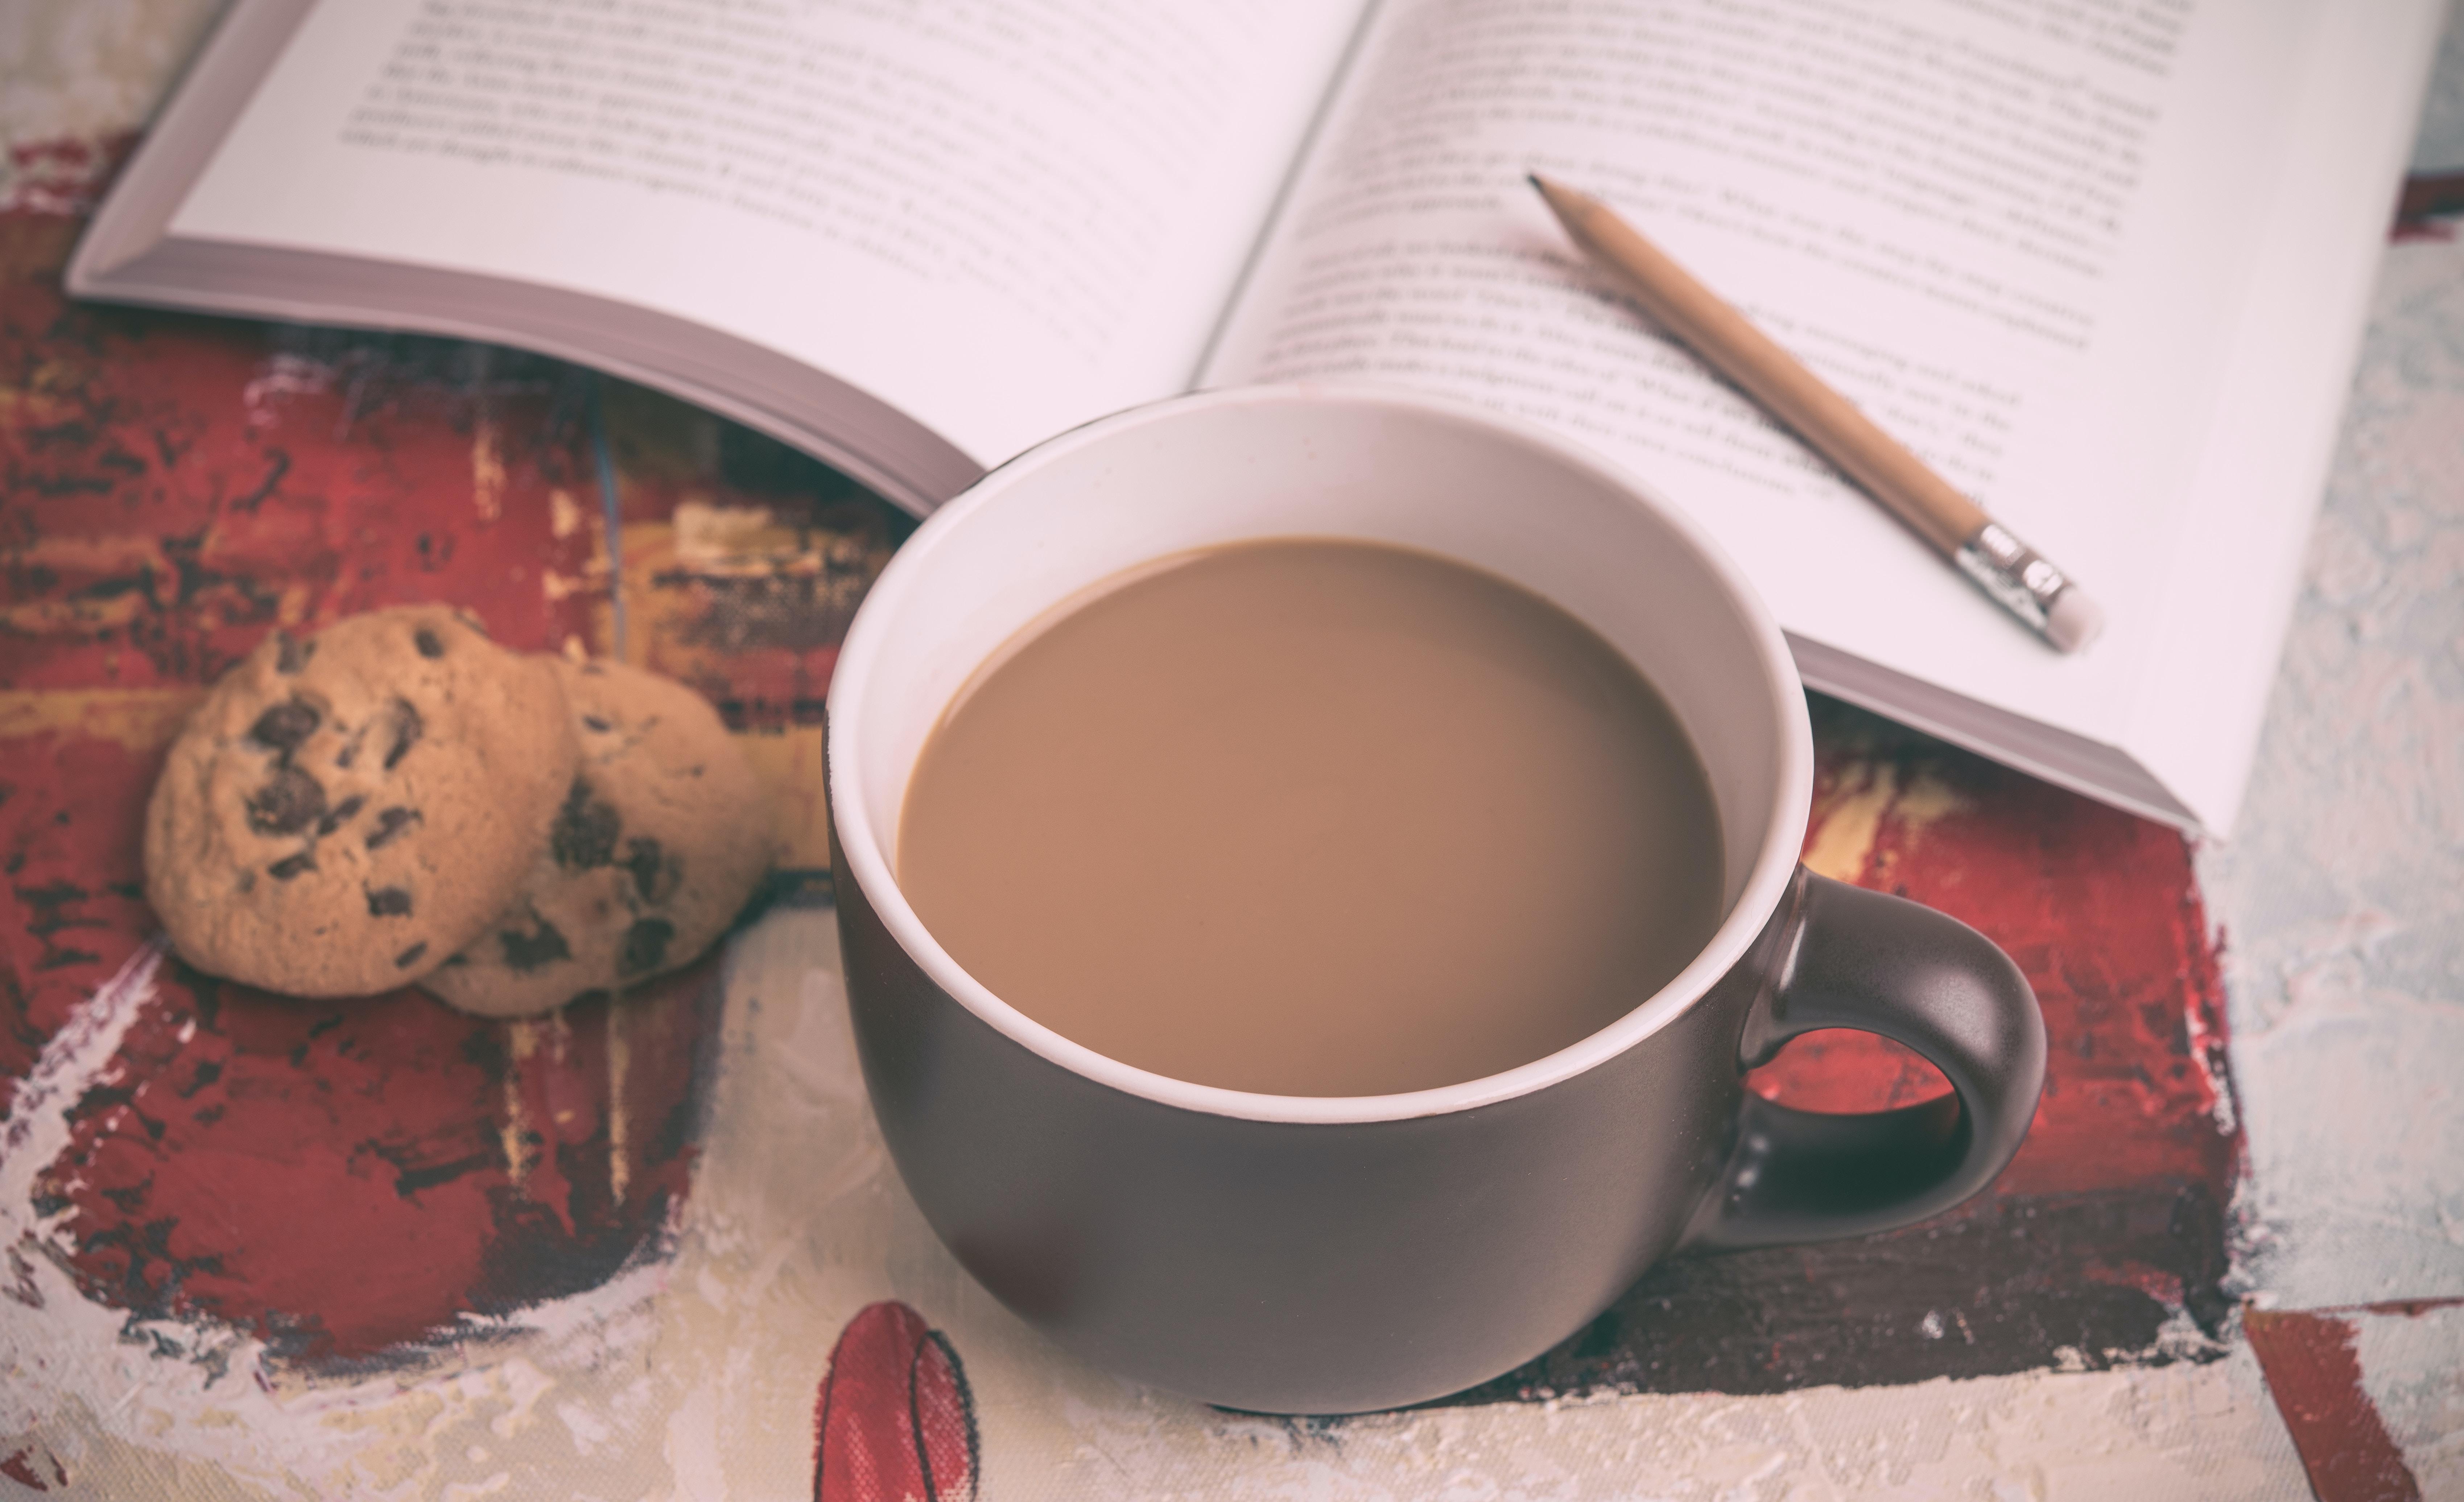 beverage filled mug beside cookie and book